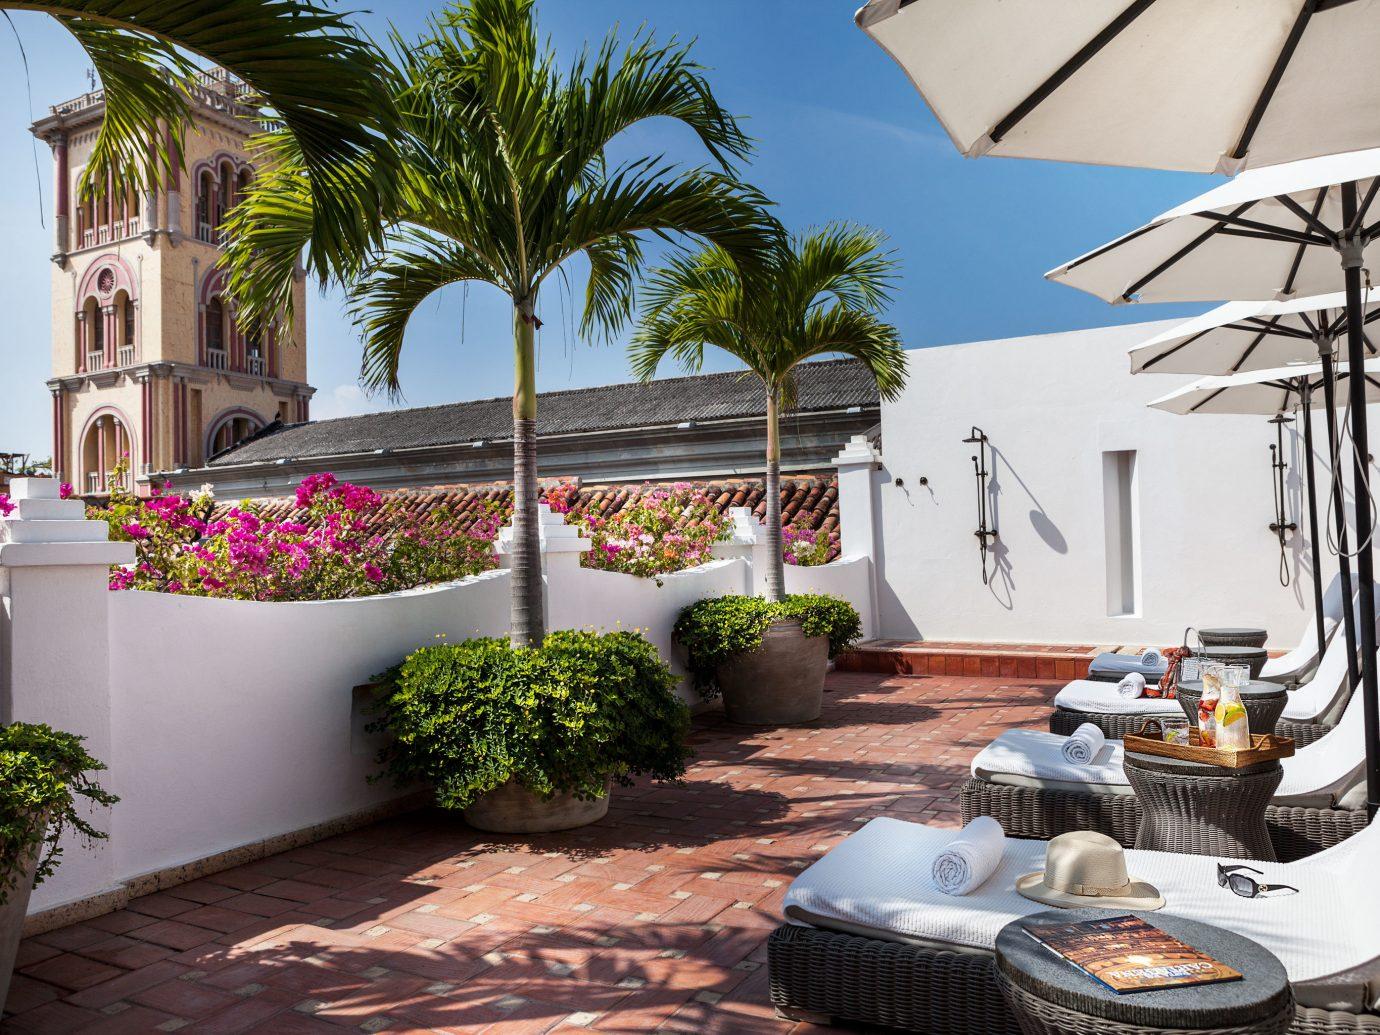 Courtyard at Hotel Casa San Agustin